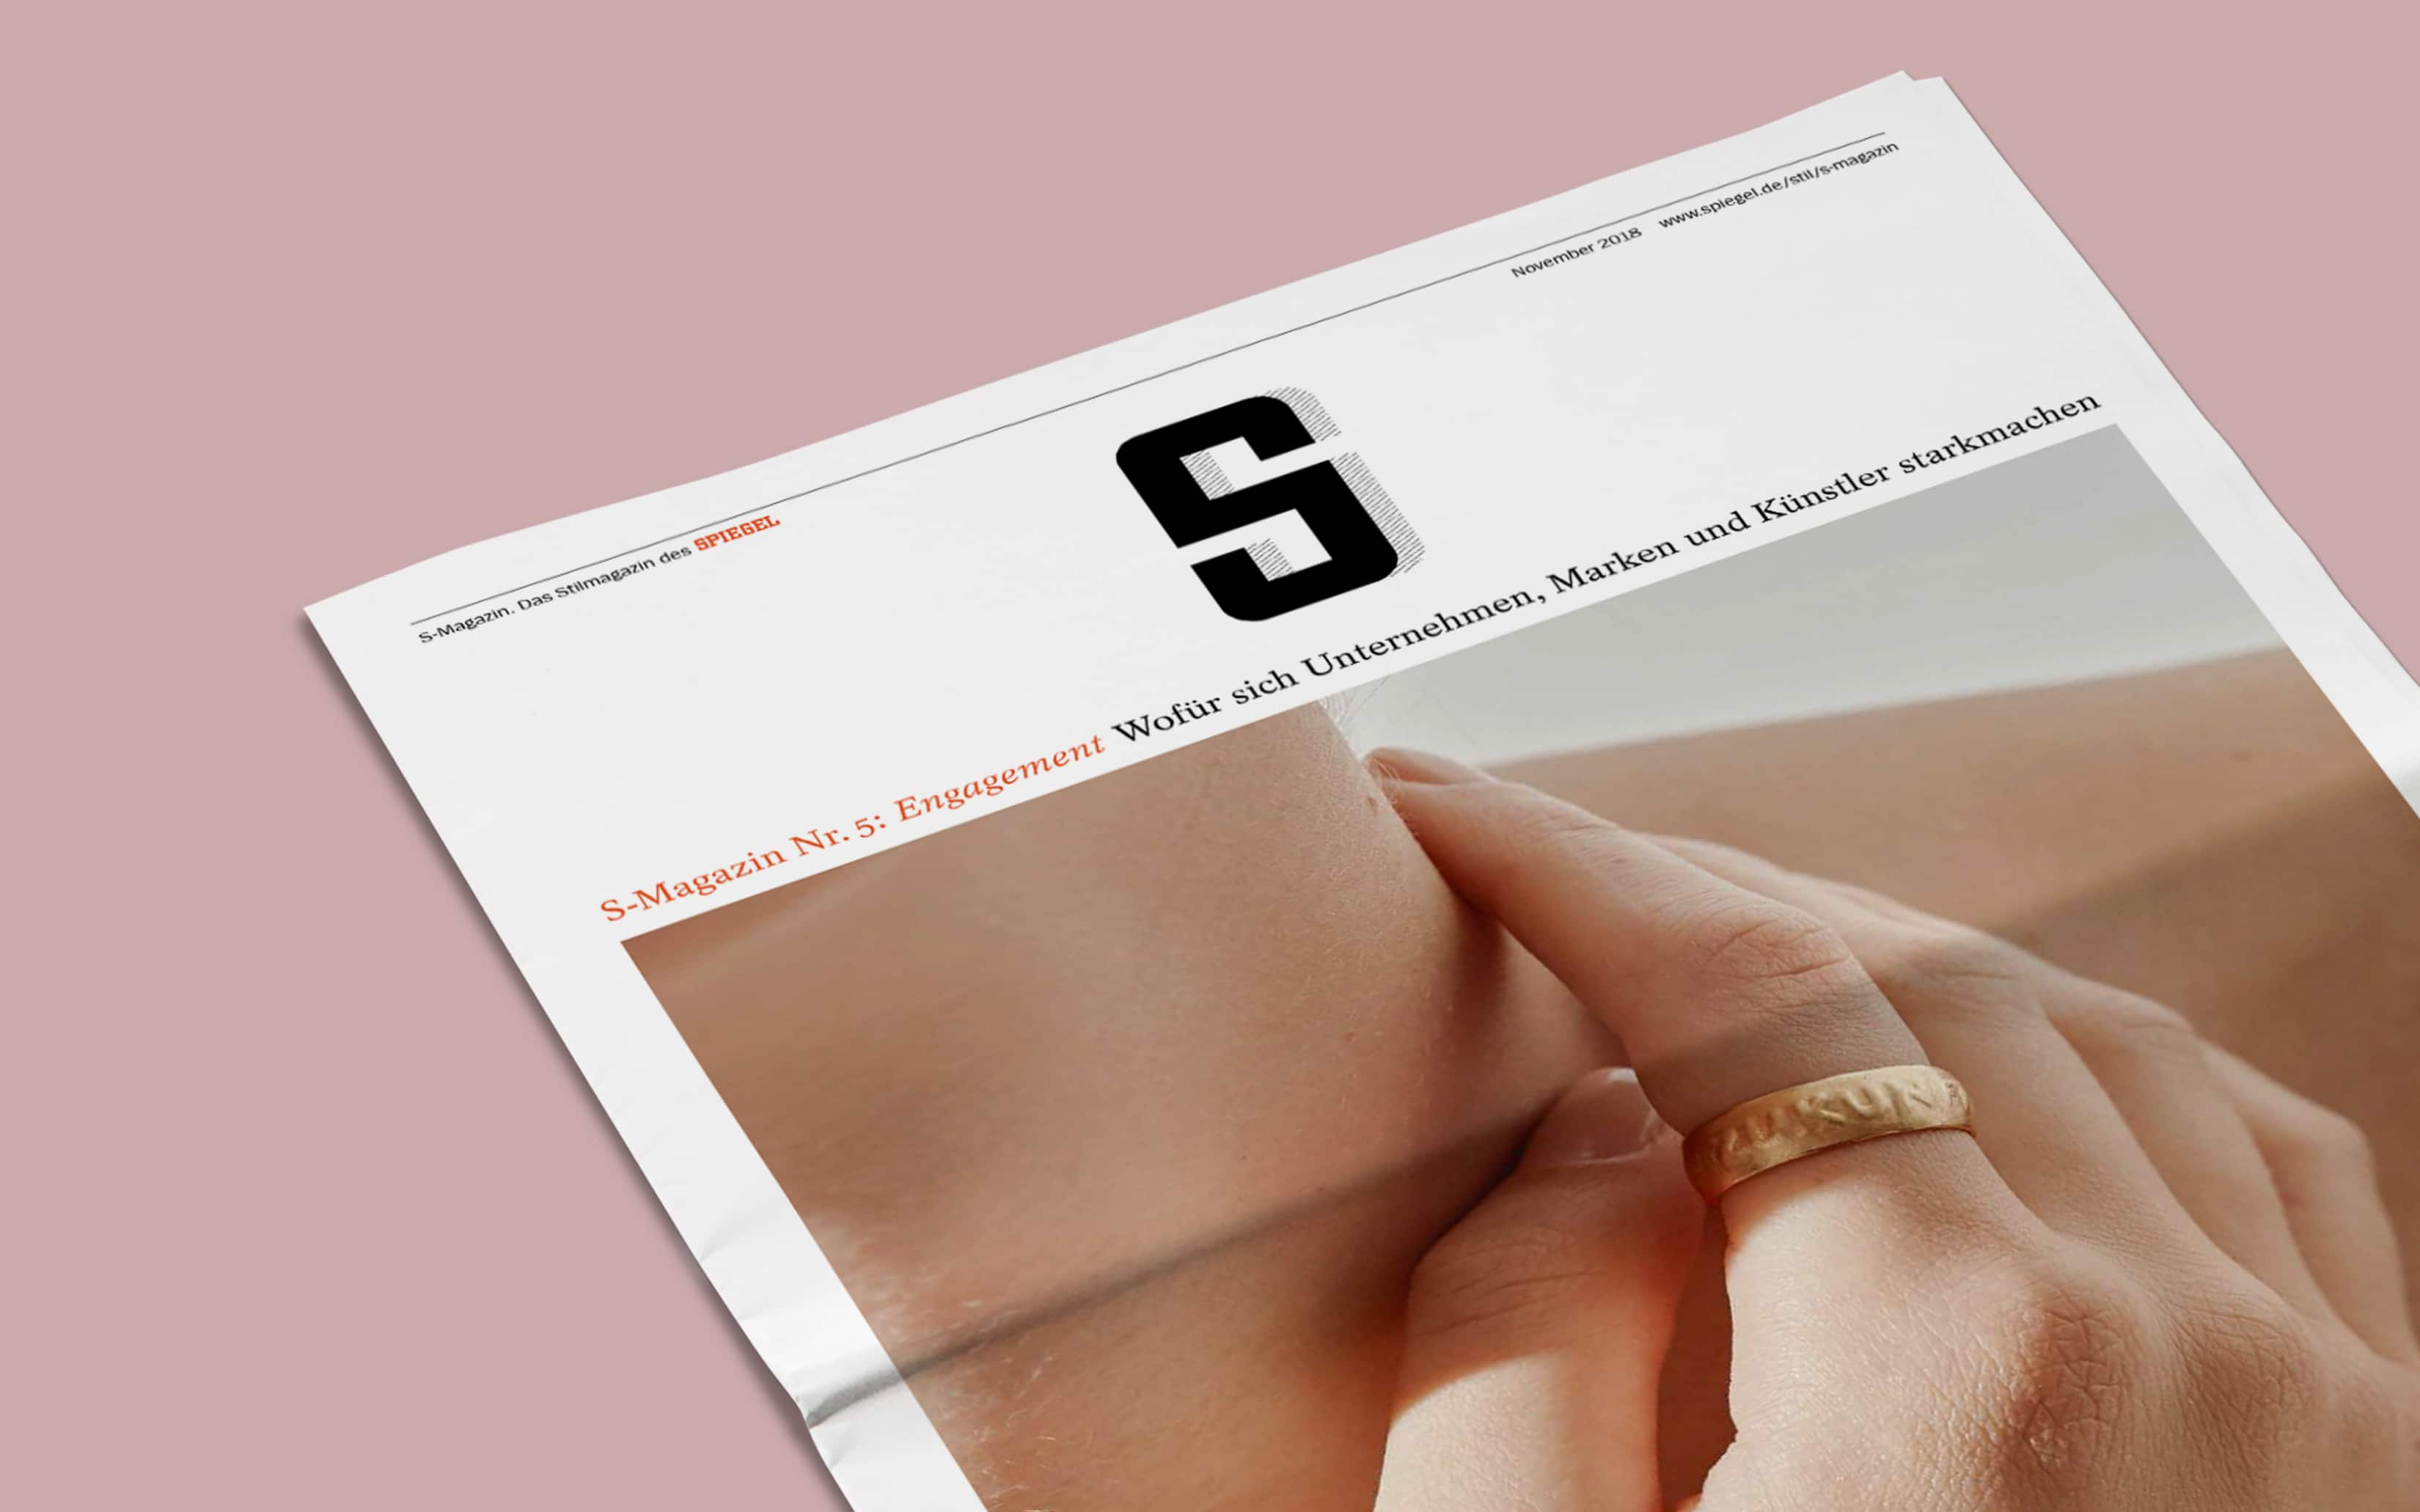 Bureau Johannes Erler – S-Magazin Nr.5: Engagement